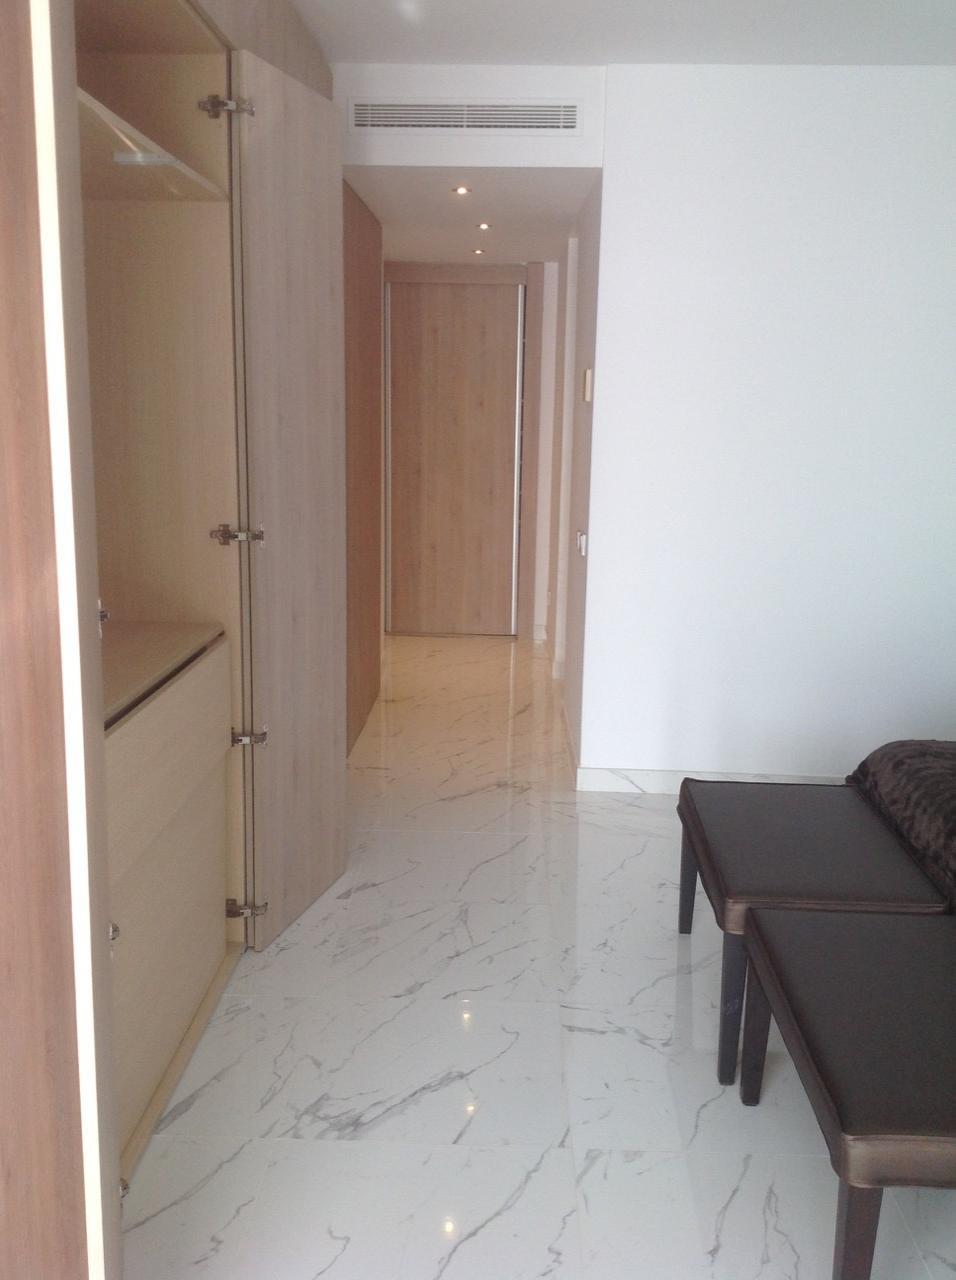 Apartment Ground Floor for sale in Los Flamingos, Costa del Sol